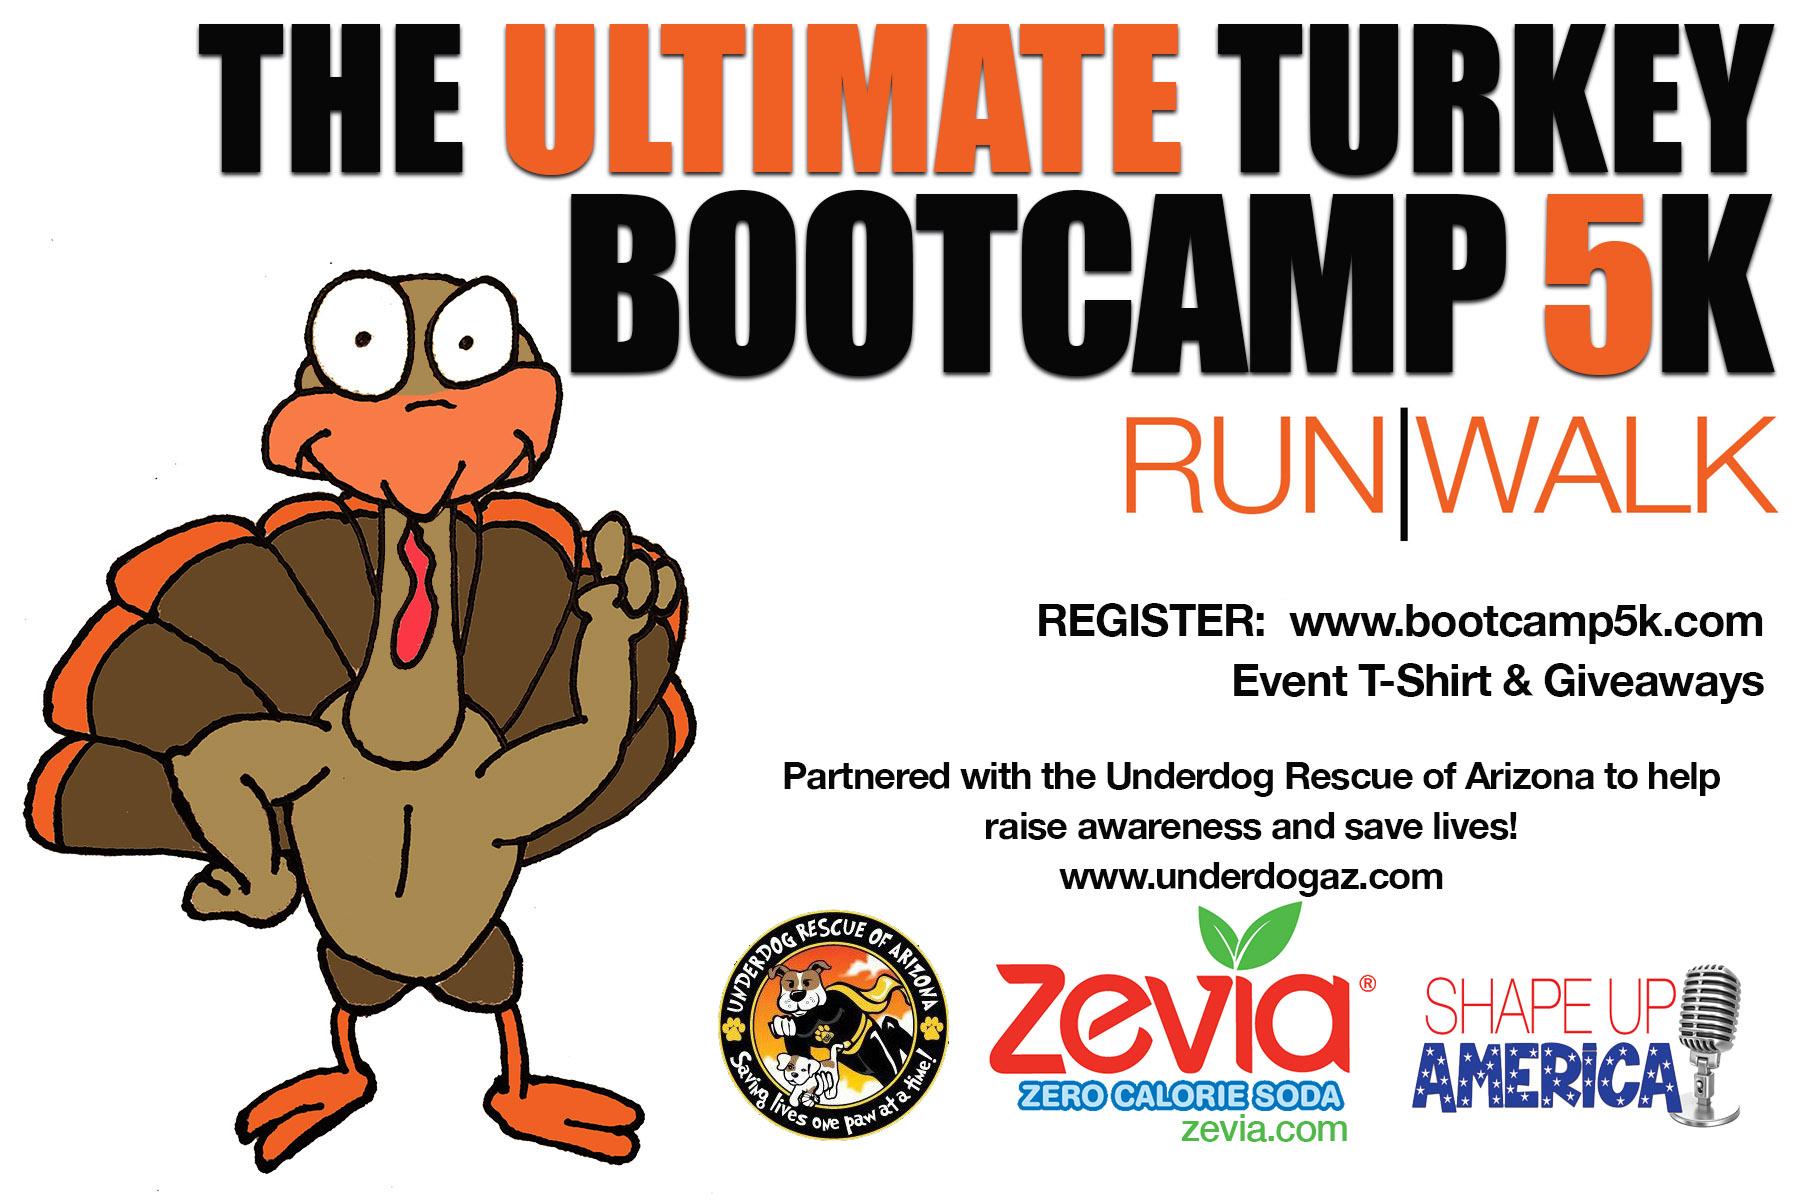 images.raceentry.com/infopages/ultimate-turkey-bootcamp-5k-runwalk-infopages-1795.jpg